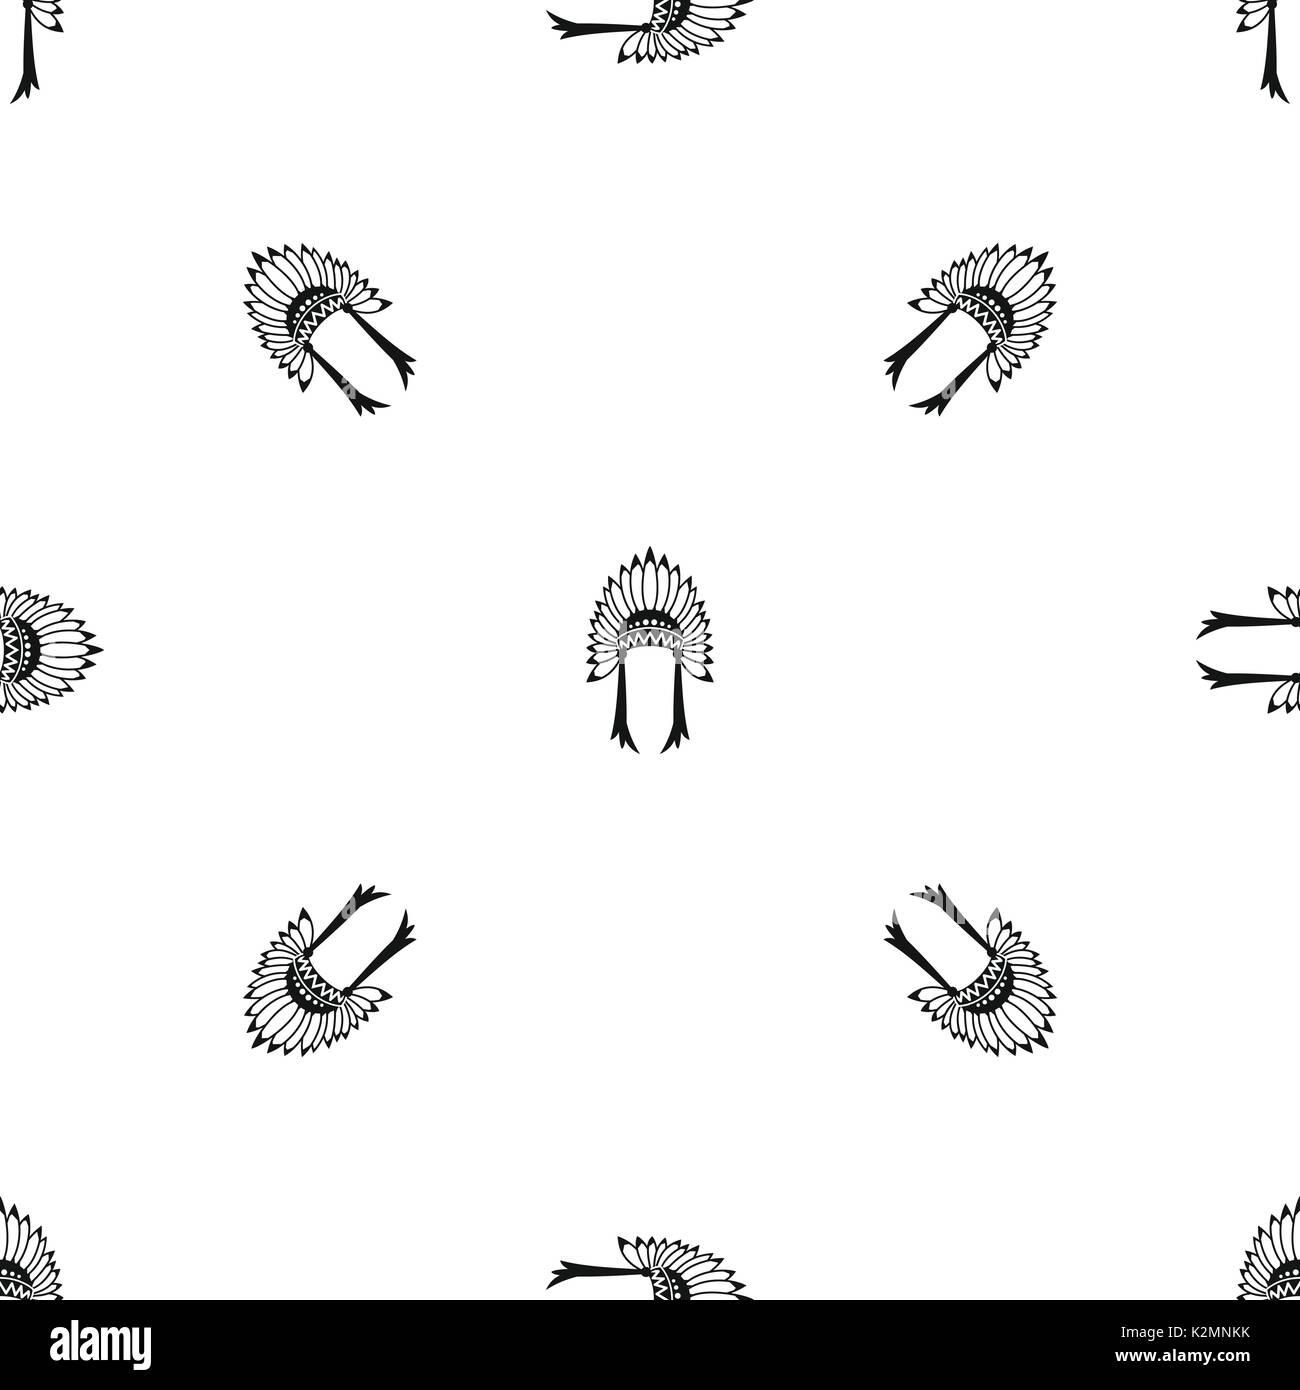 Indian headdress pattern seamless black - Stock Image